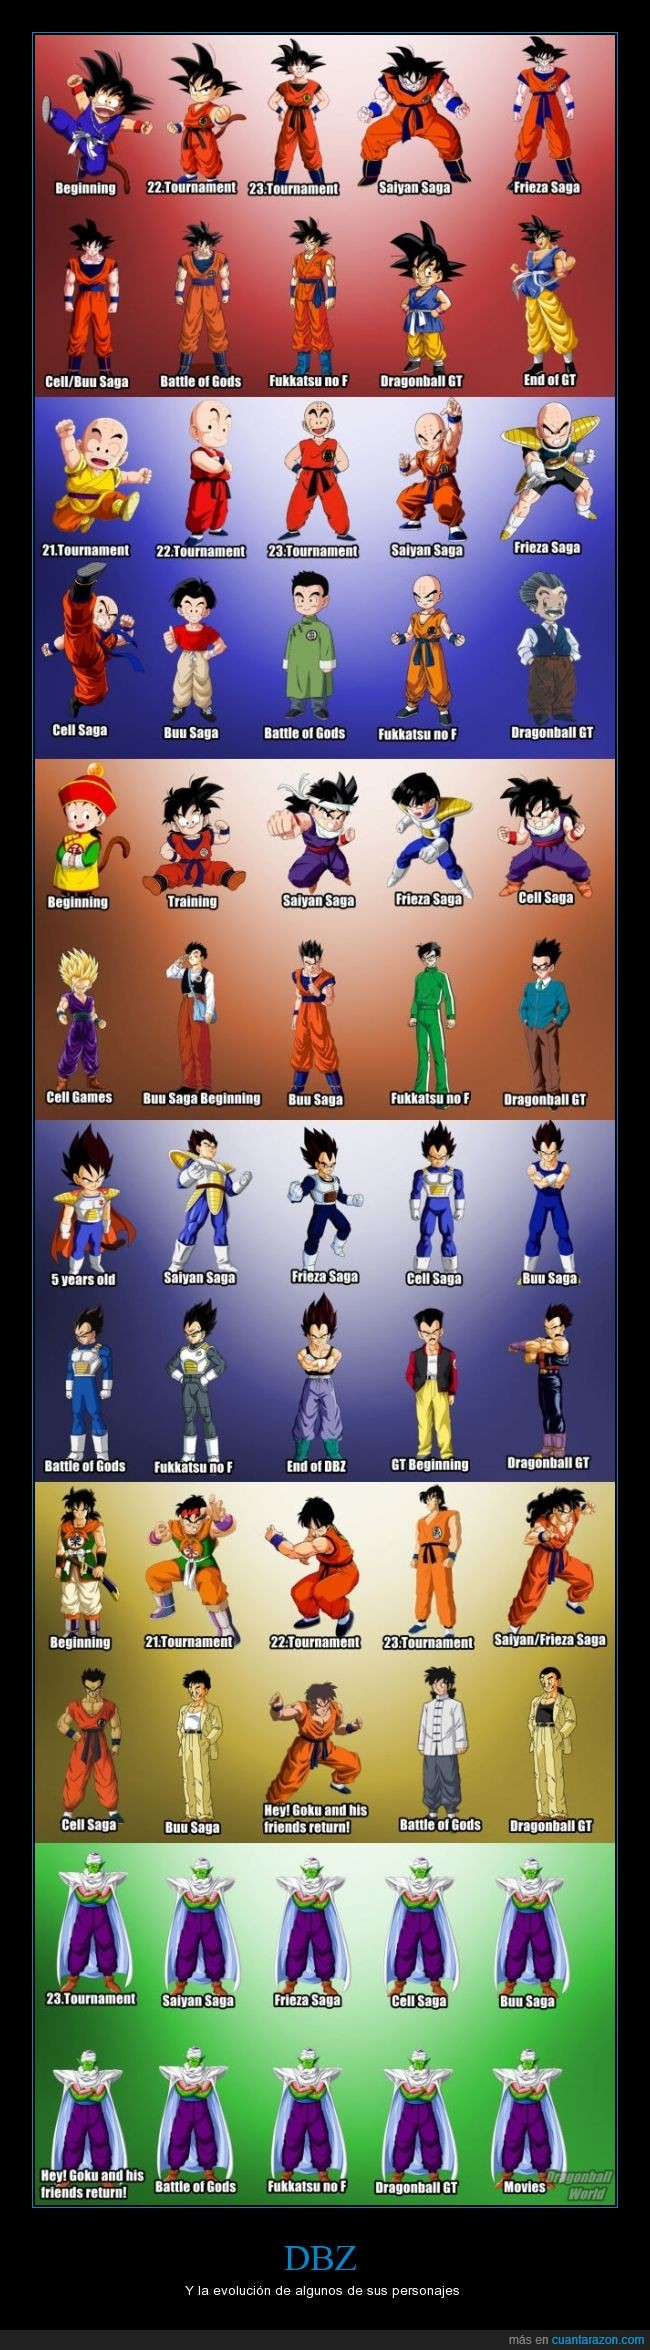 anime,db,dbgt,dbz,dragon ball,dragon ball gt,dragon ball z,gohan,goku,krillin,piccolo,vegeta,yamcha